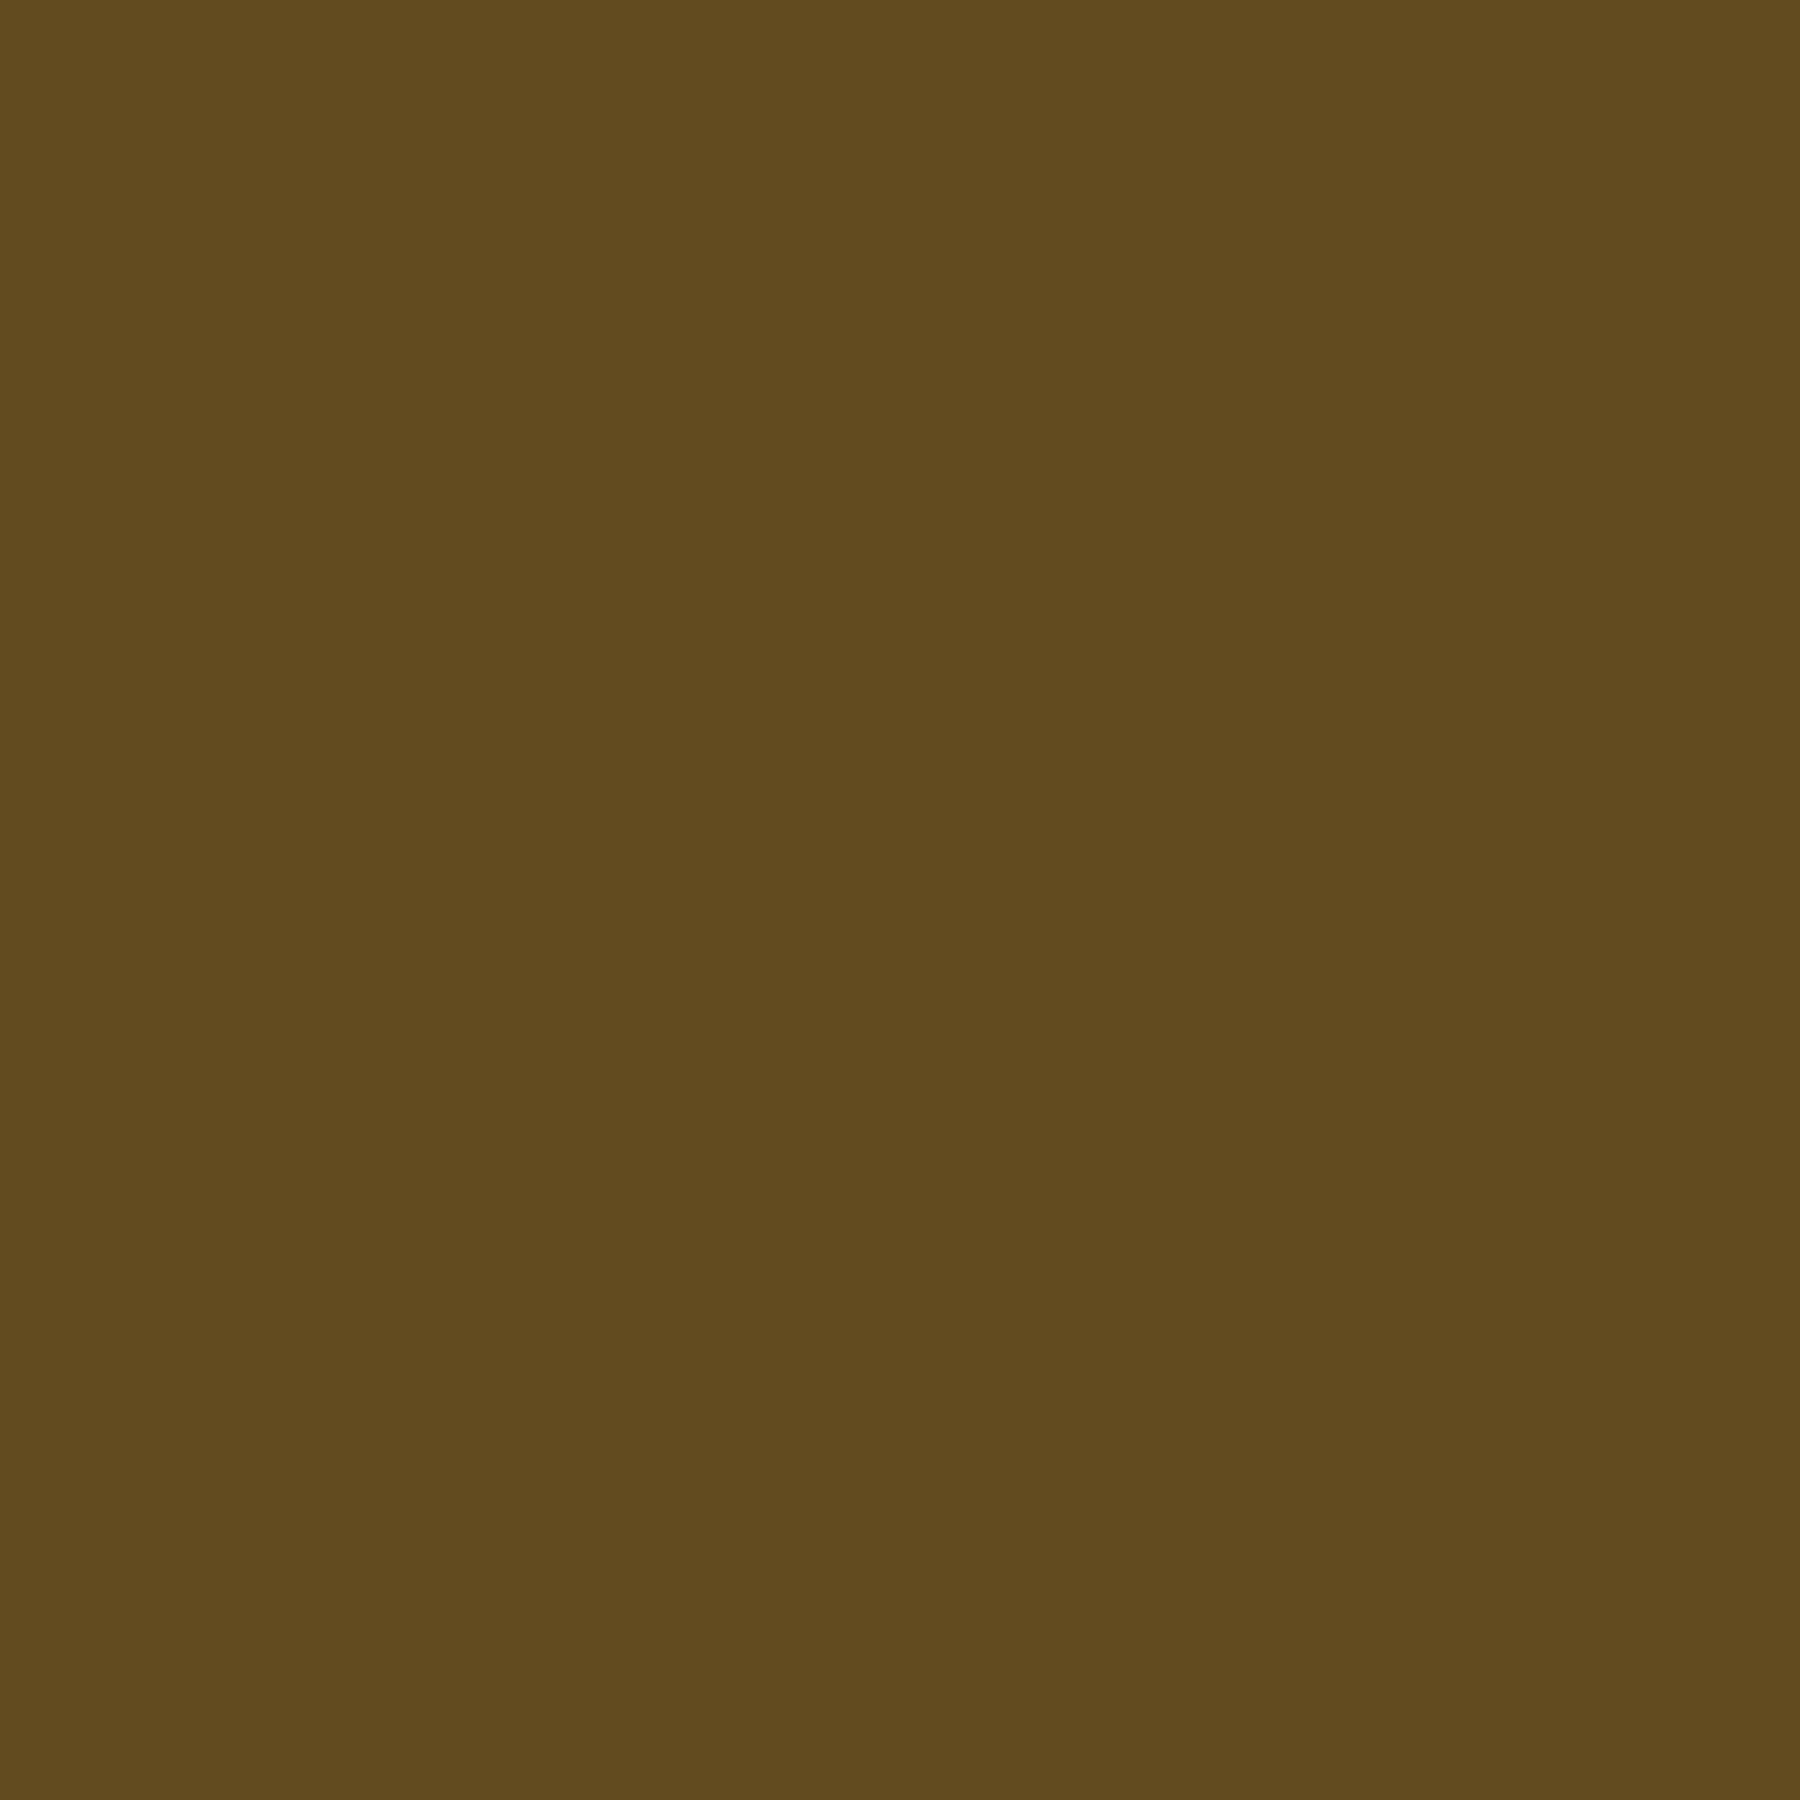 Spice - Leather Dye